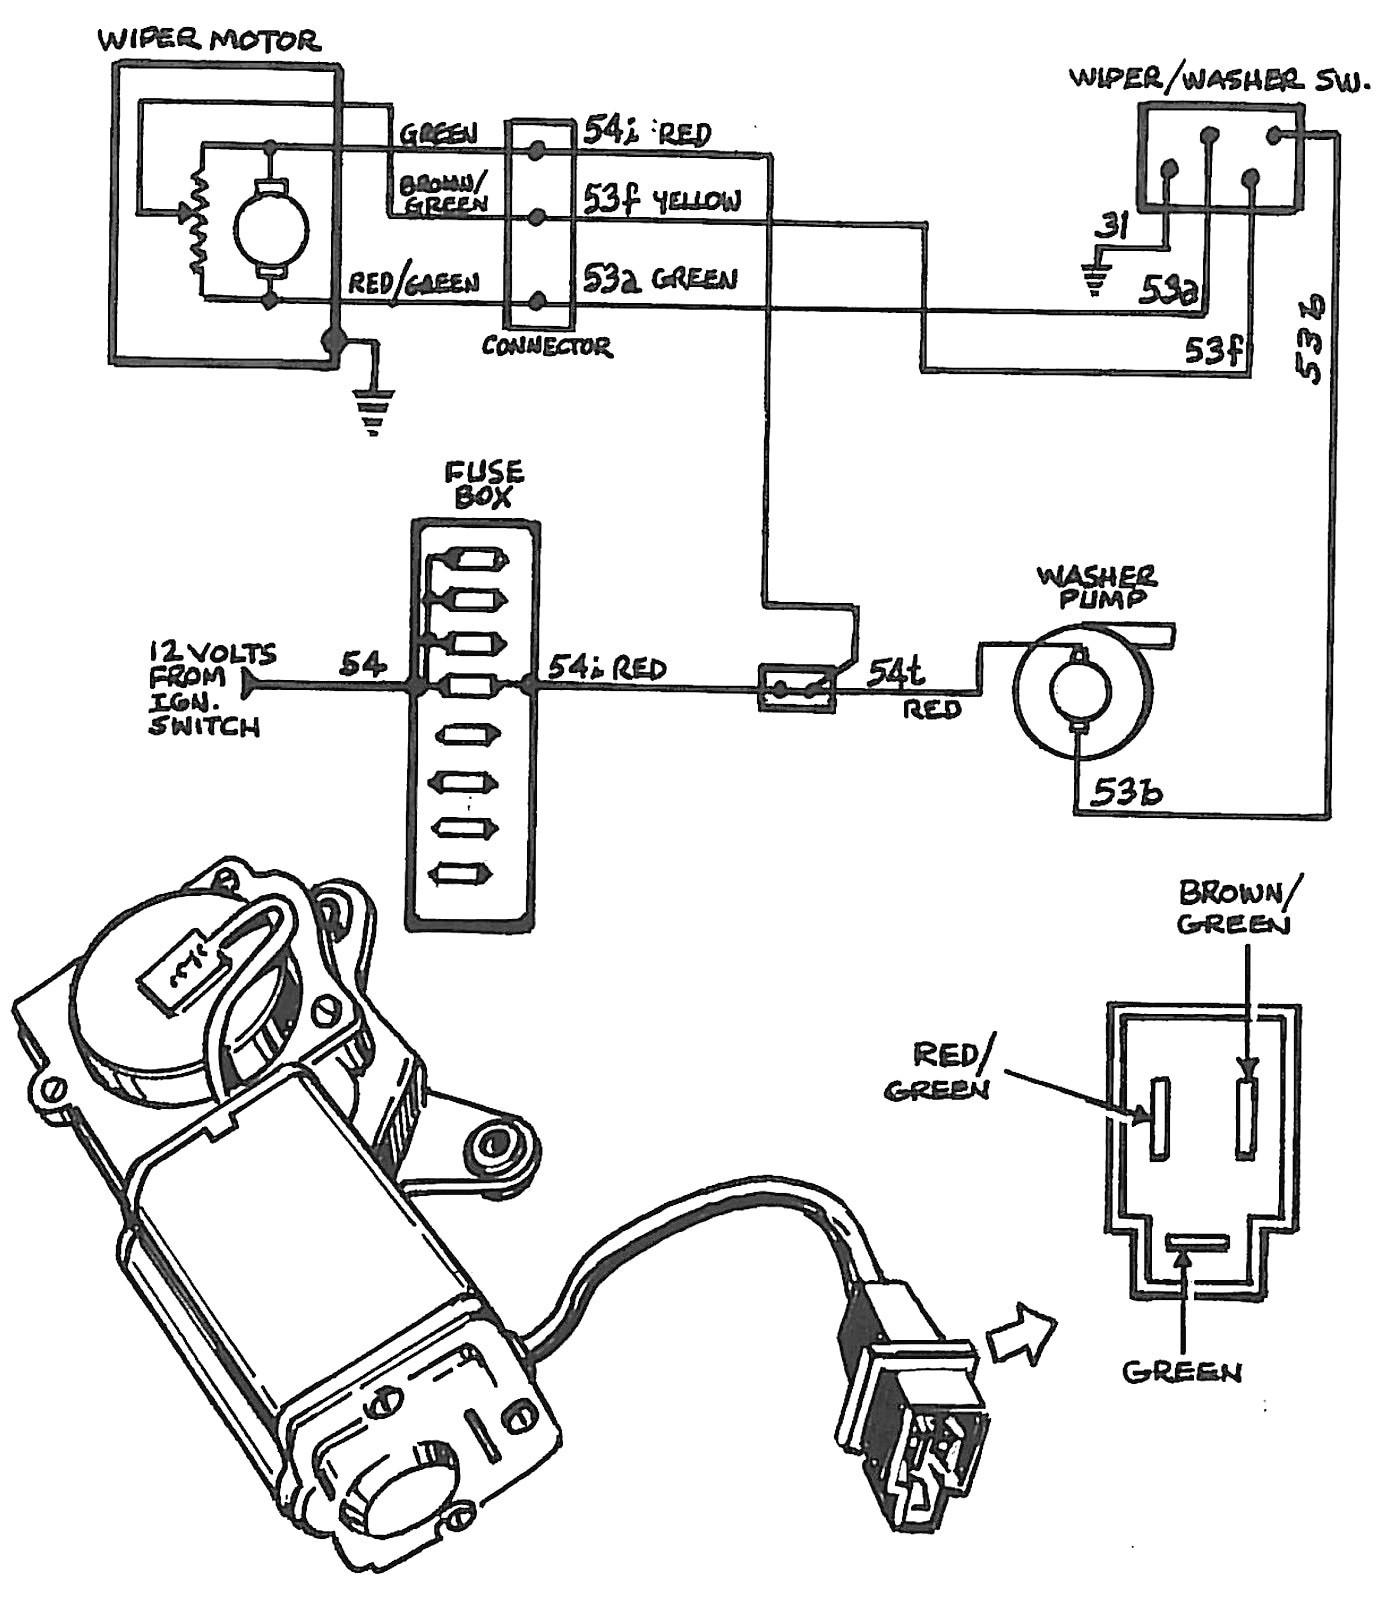 Wiper motor wiring diagram chevrolet new wiring diagram image rh mai reasurechest